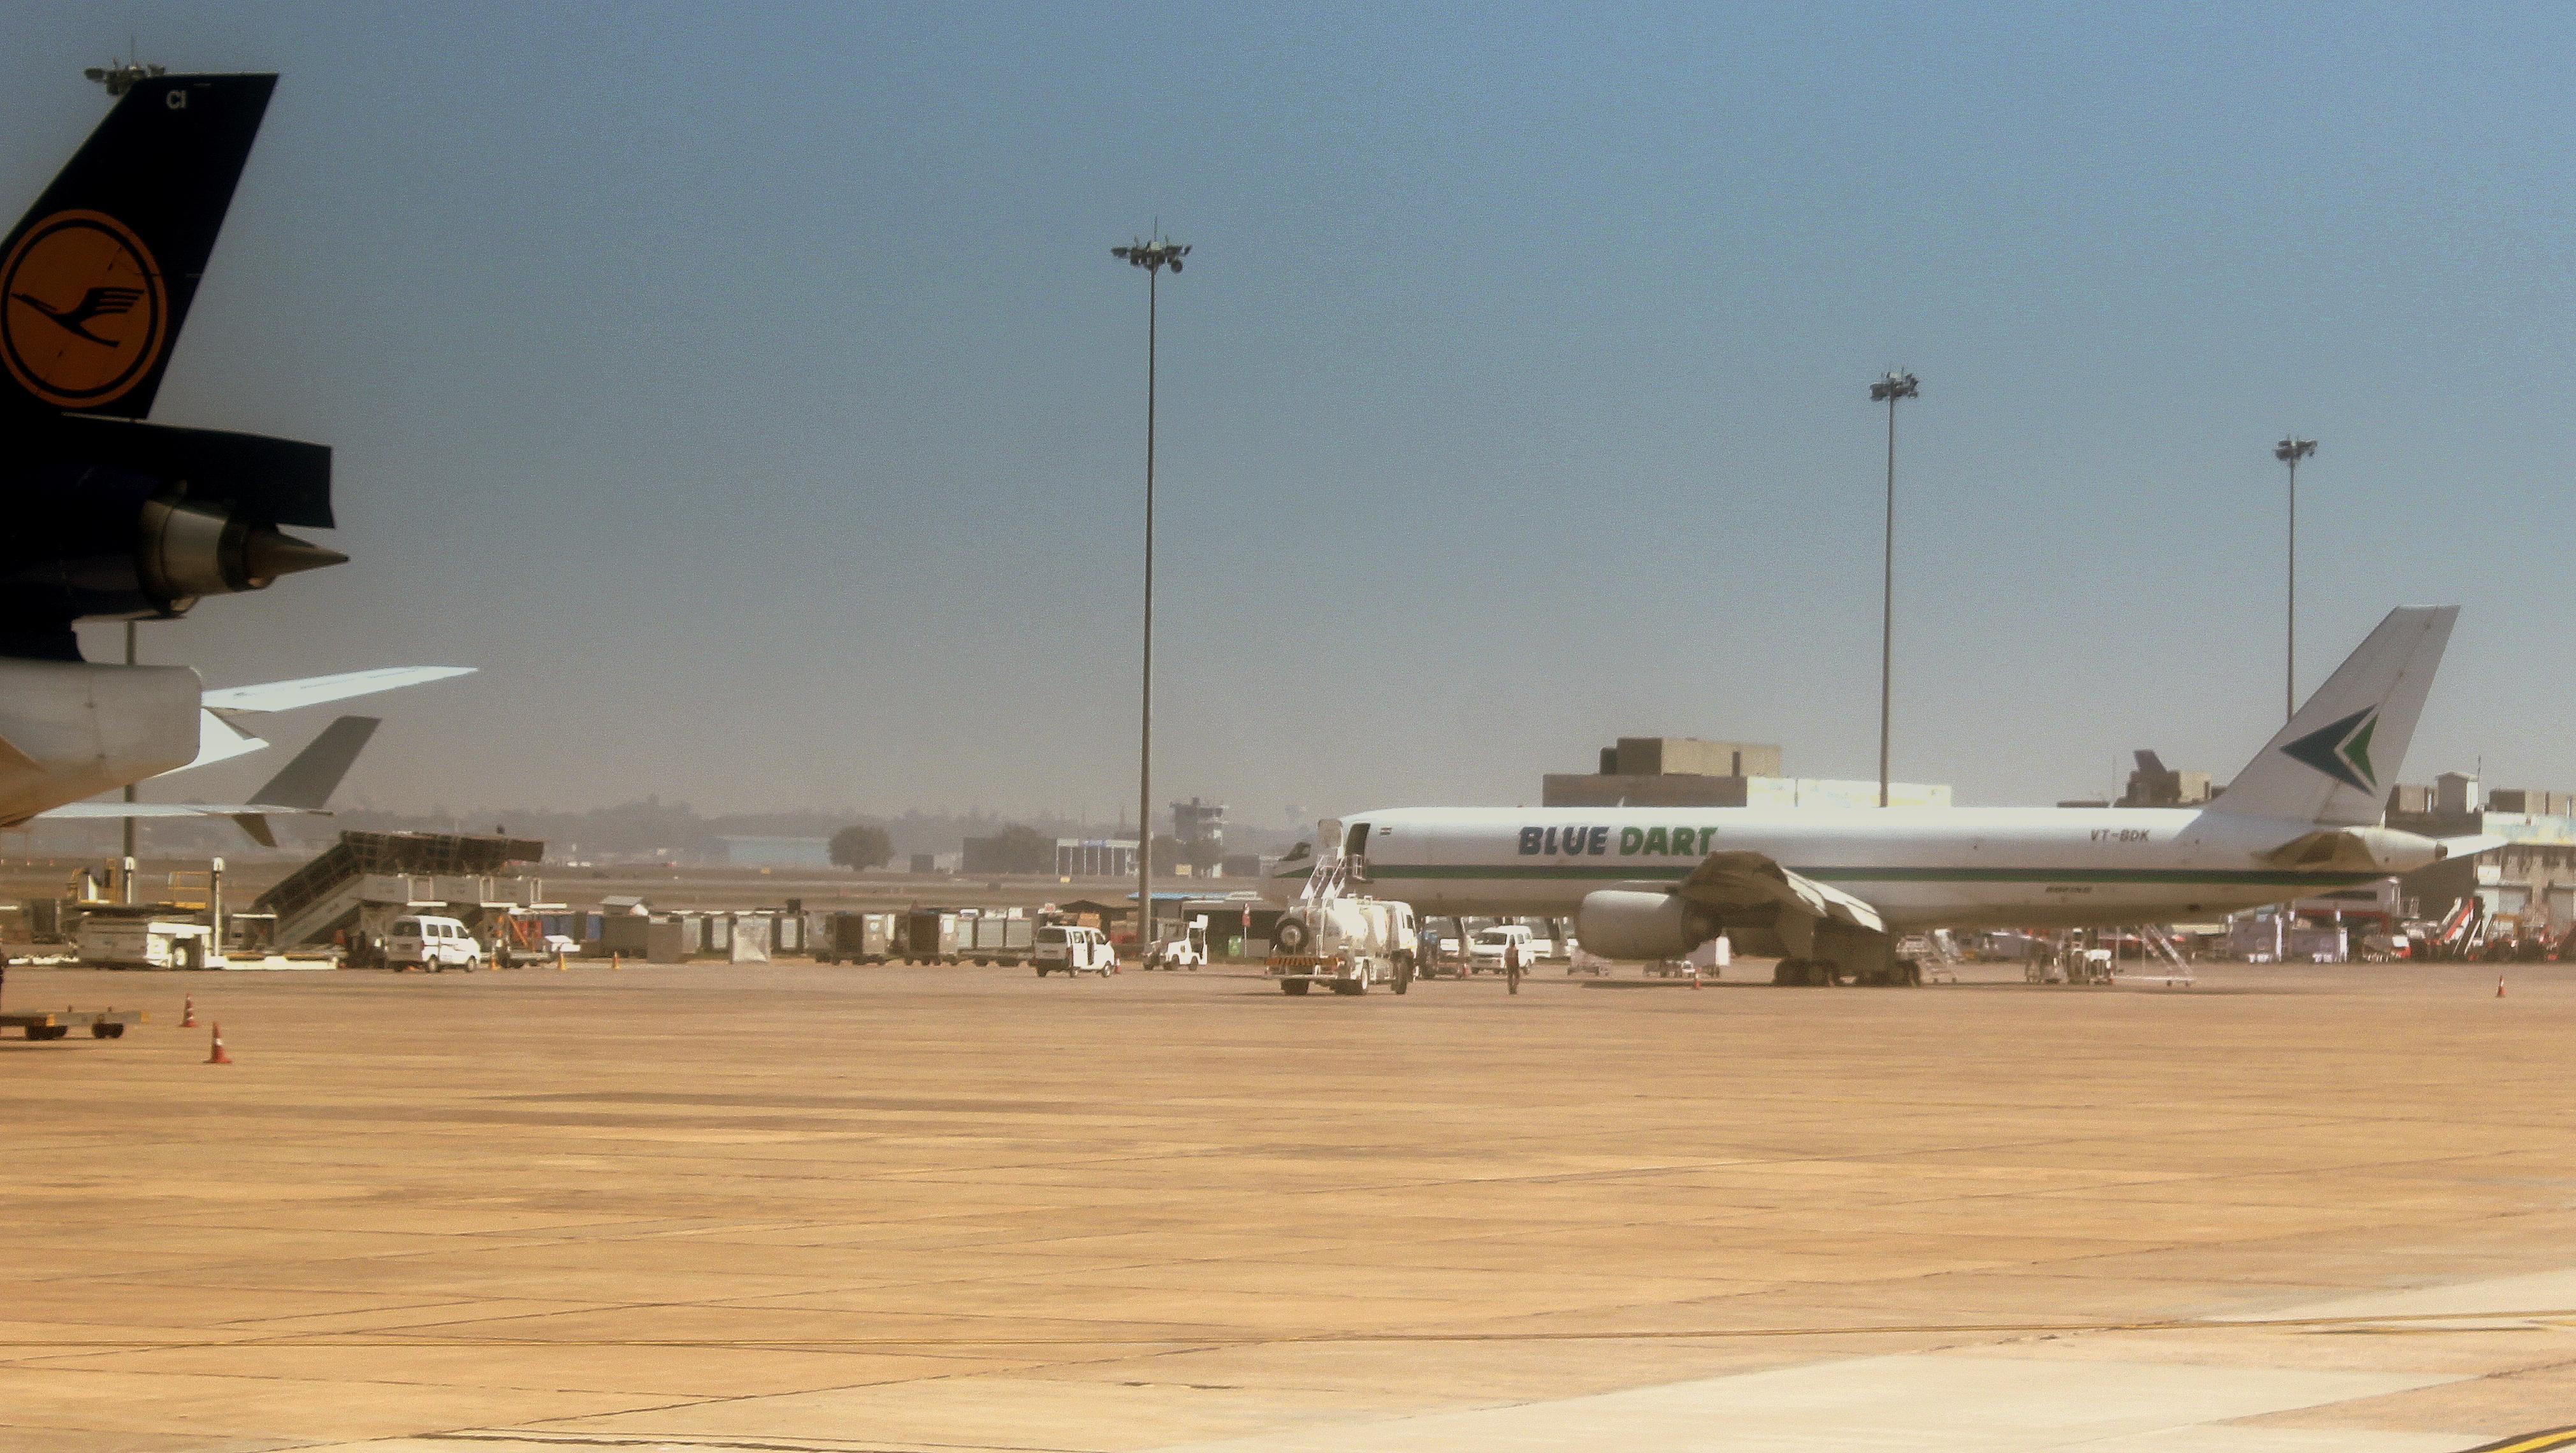 File:BLUE DART BOEING 757-200 FREIGHTER AT Indira Gandhi AIRPORT